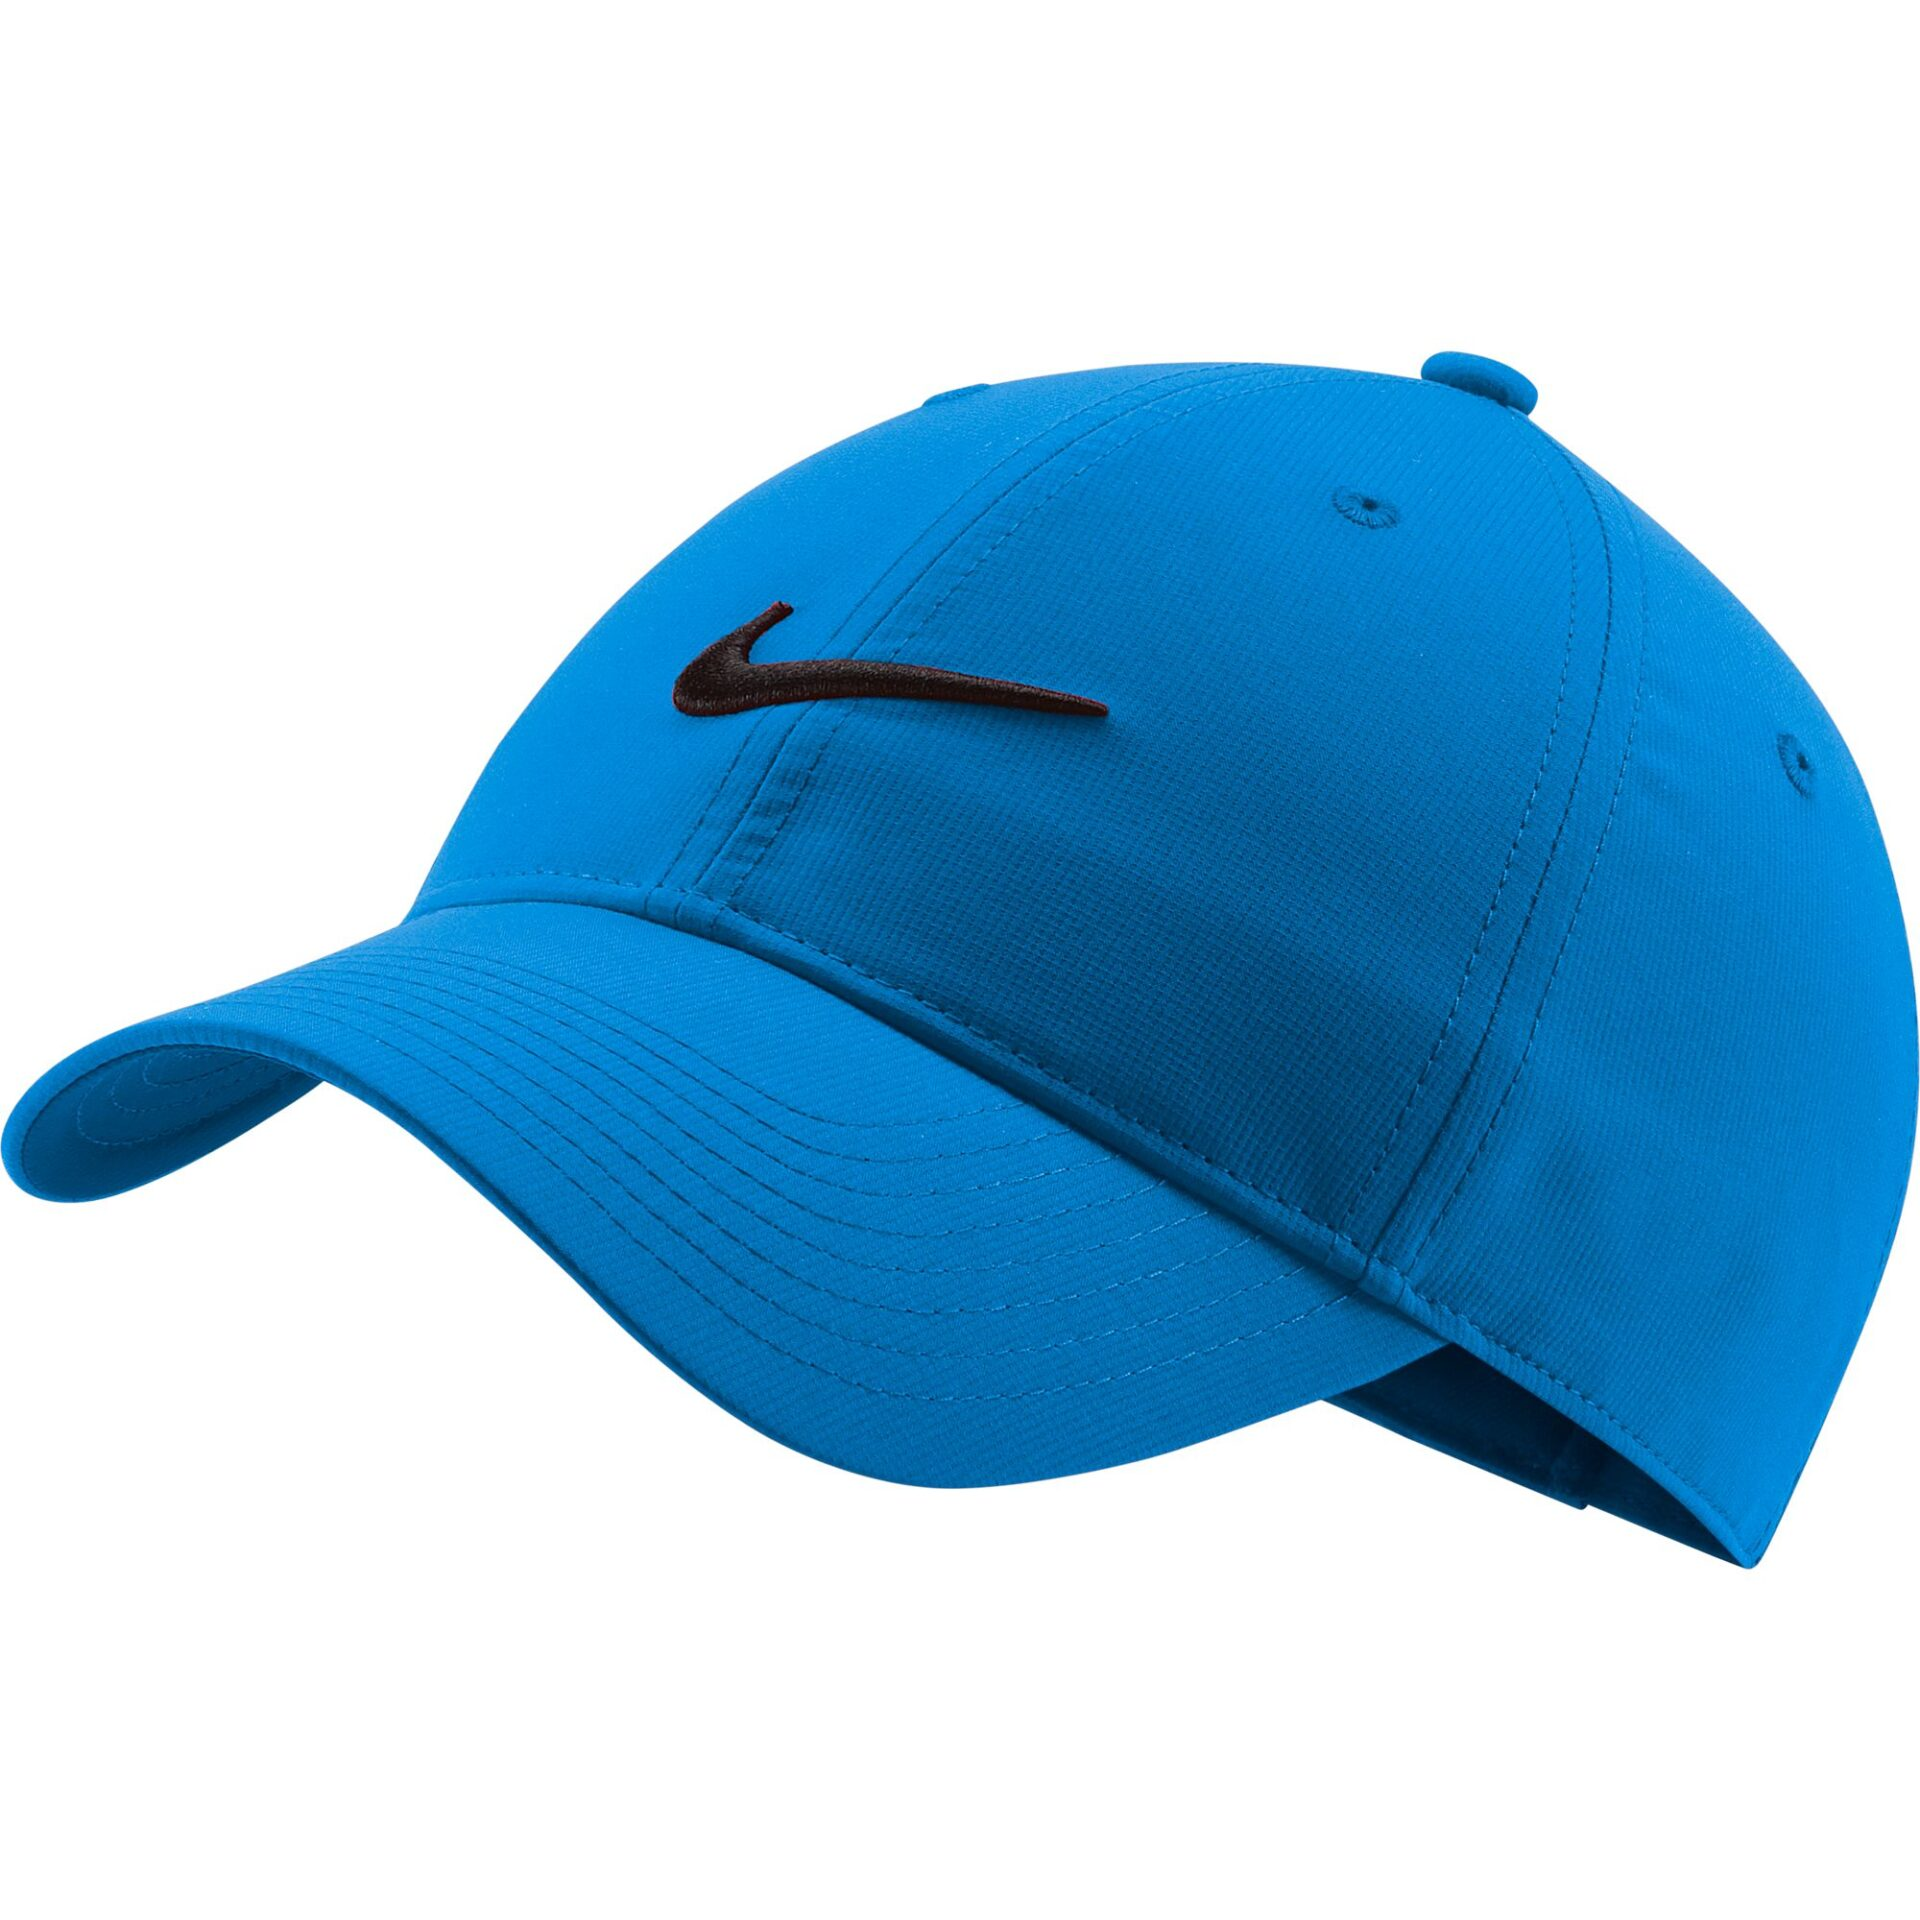 Golf, Tennis, Running Caps, Visors, & Bucket Hats